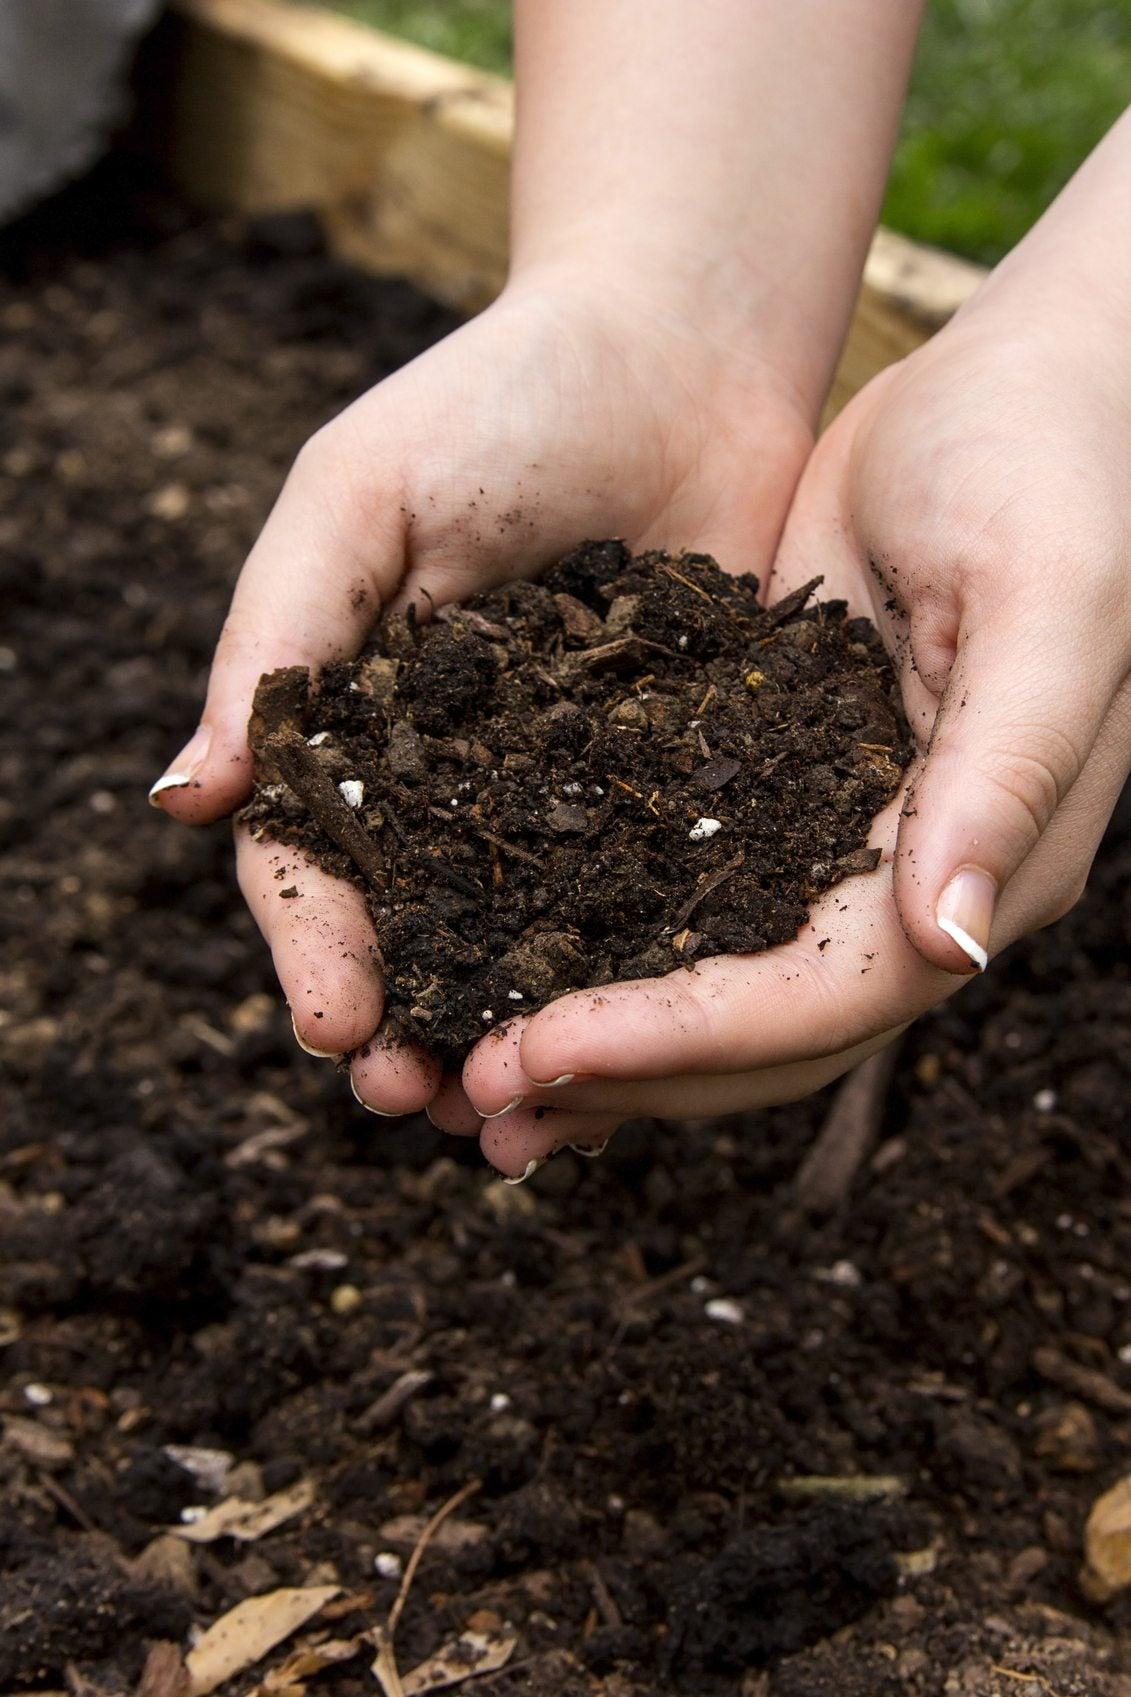 Raised garden bed soil which soil type for raised beds - Best mulch for raised bed vegetable garden ...